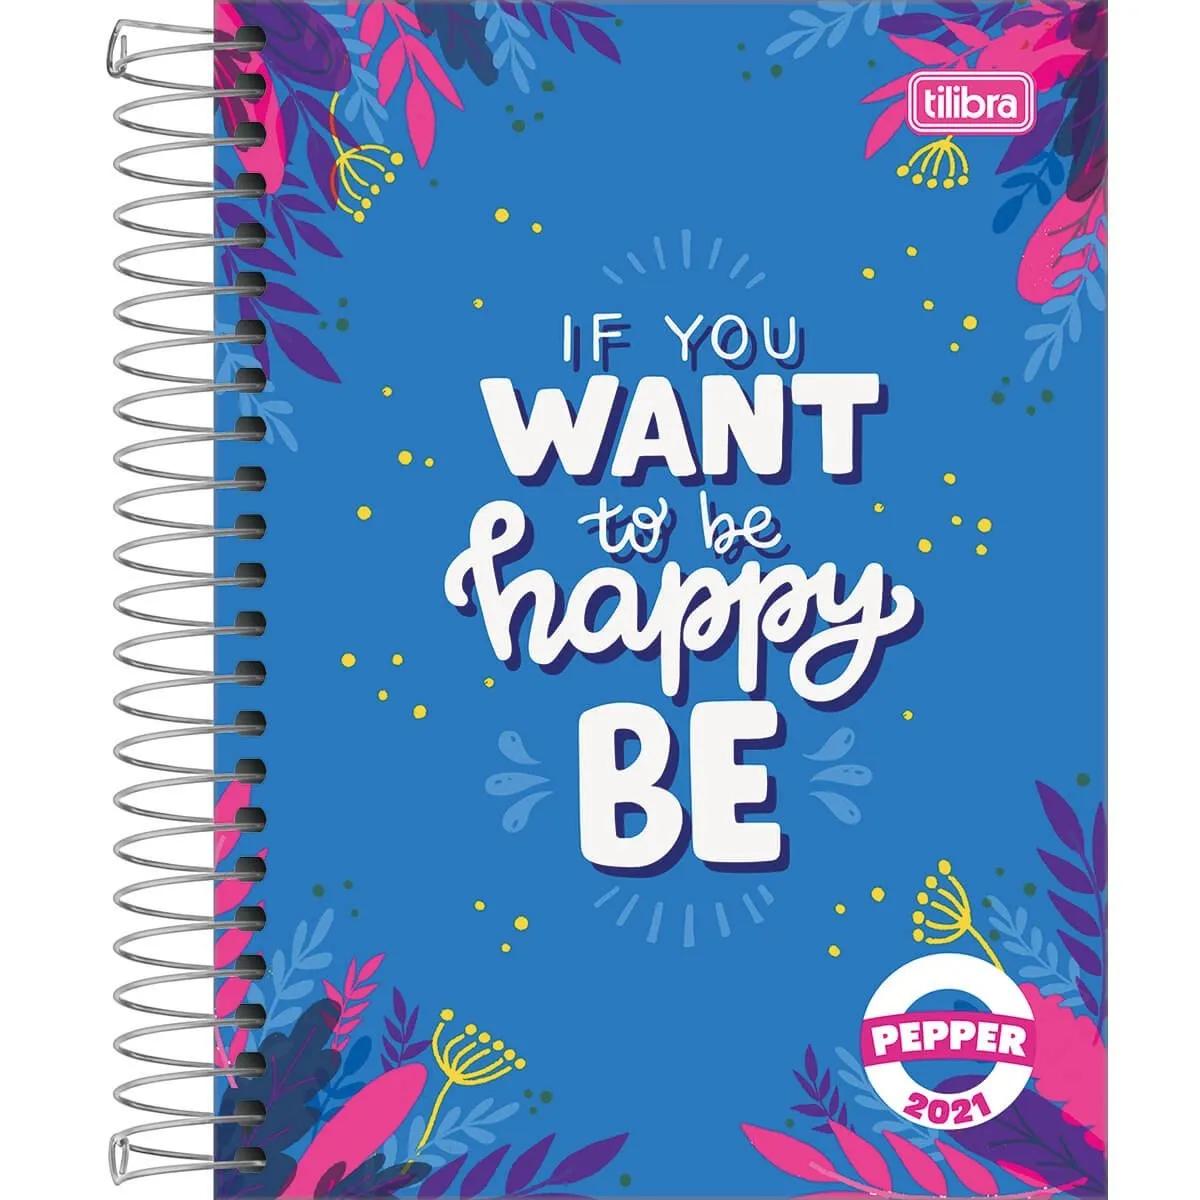 Agenda Espiral 2021 Pepper Feminina M4 Tilibra